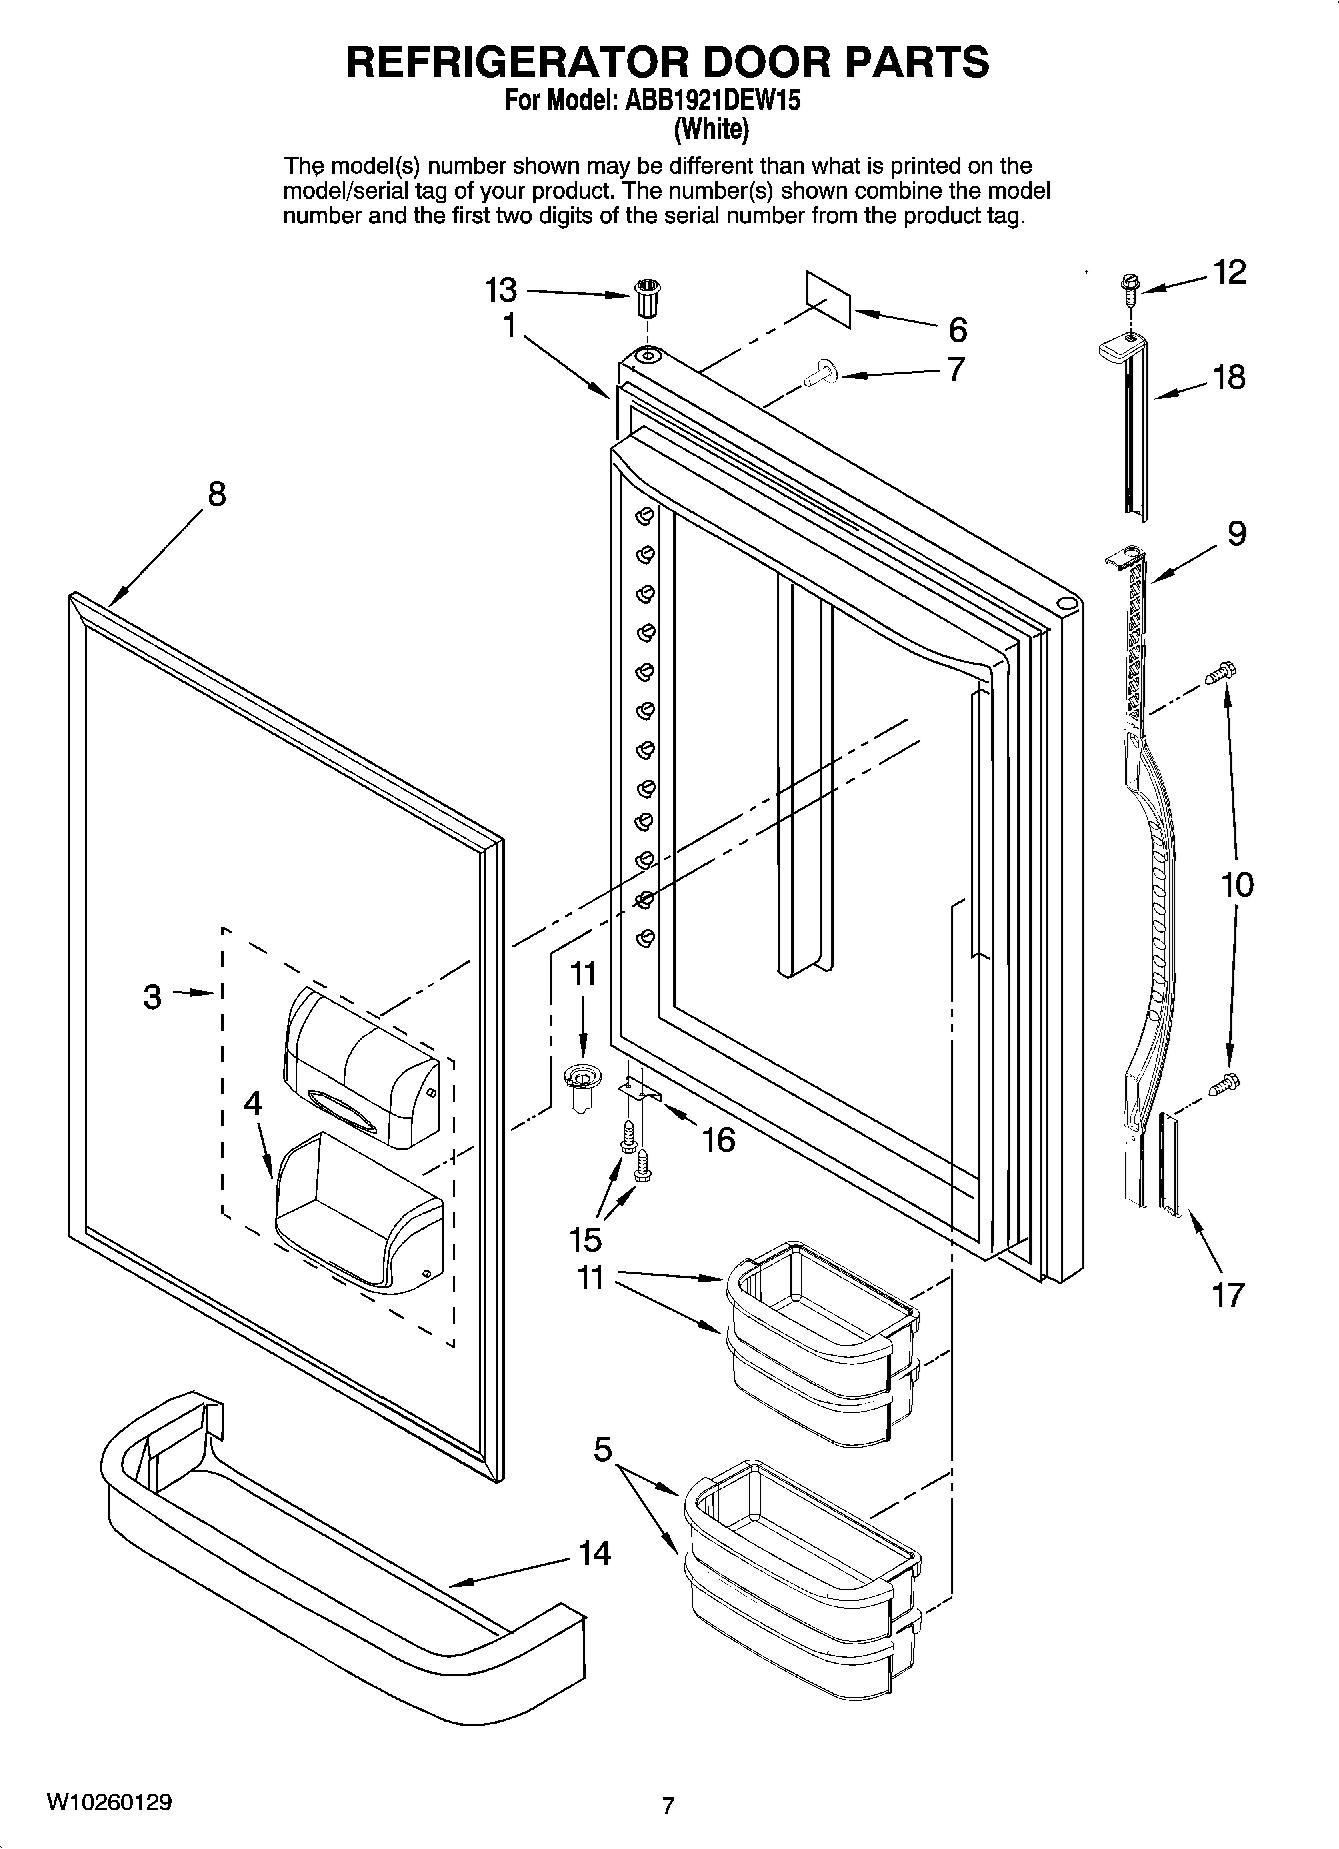 MaytagImg_19000101 20150720_00007103?width\\\\\\\\\\\\\\=1000 wiring diagram melex golf cart love wiring diagram ideas battery wiring diagram melex golf cart at n-0.co